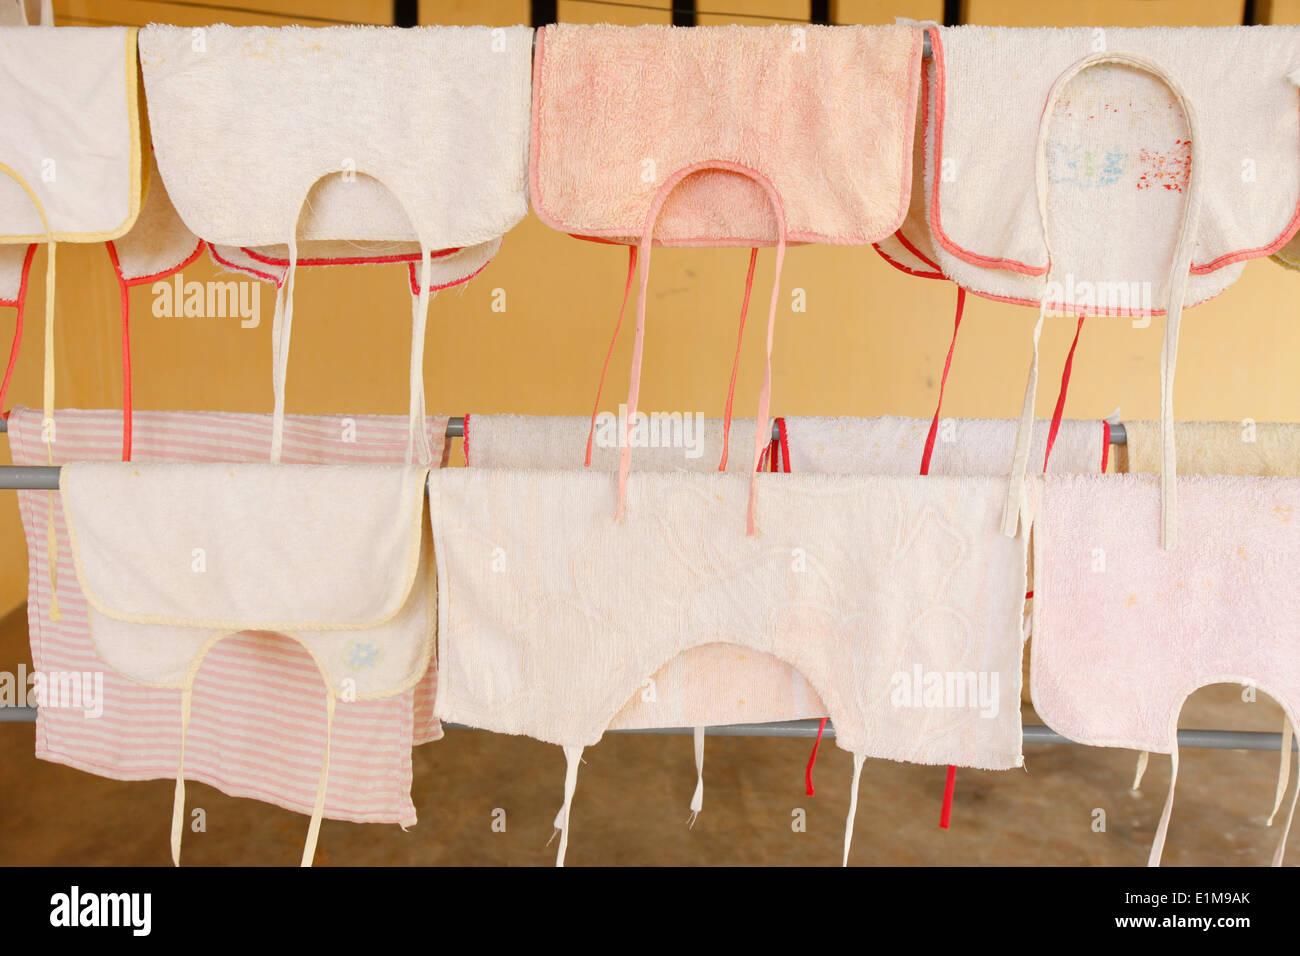 Nursery & Kindergarten run by catholic nuns - Stock Image